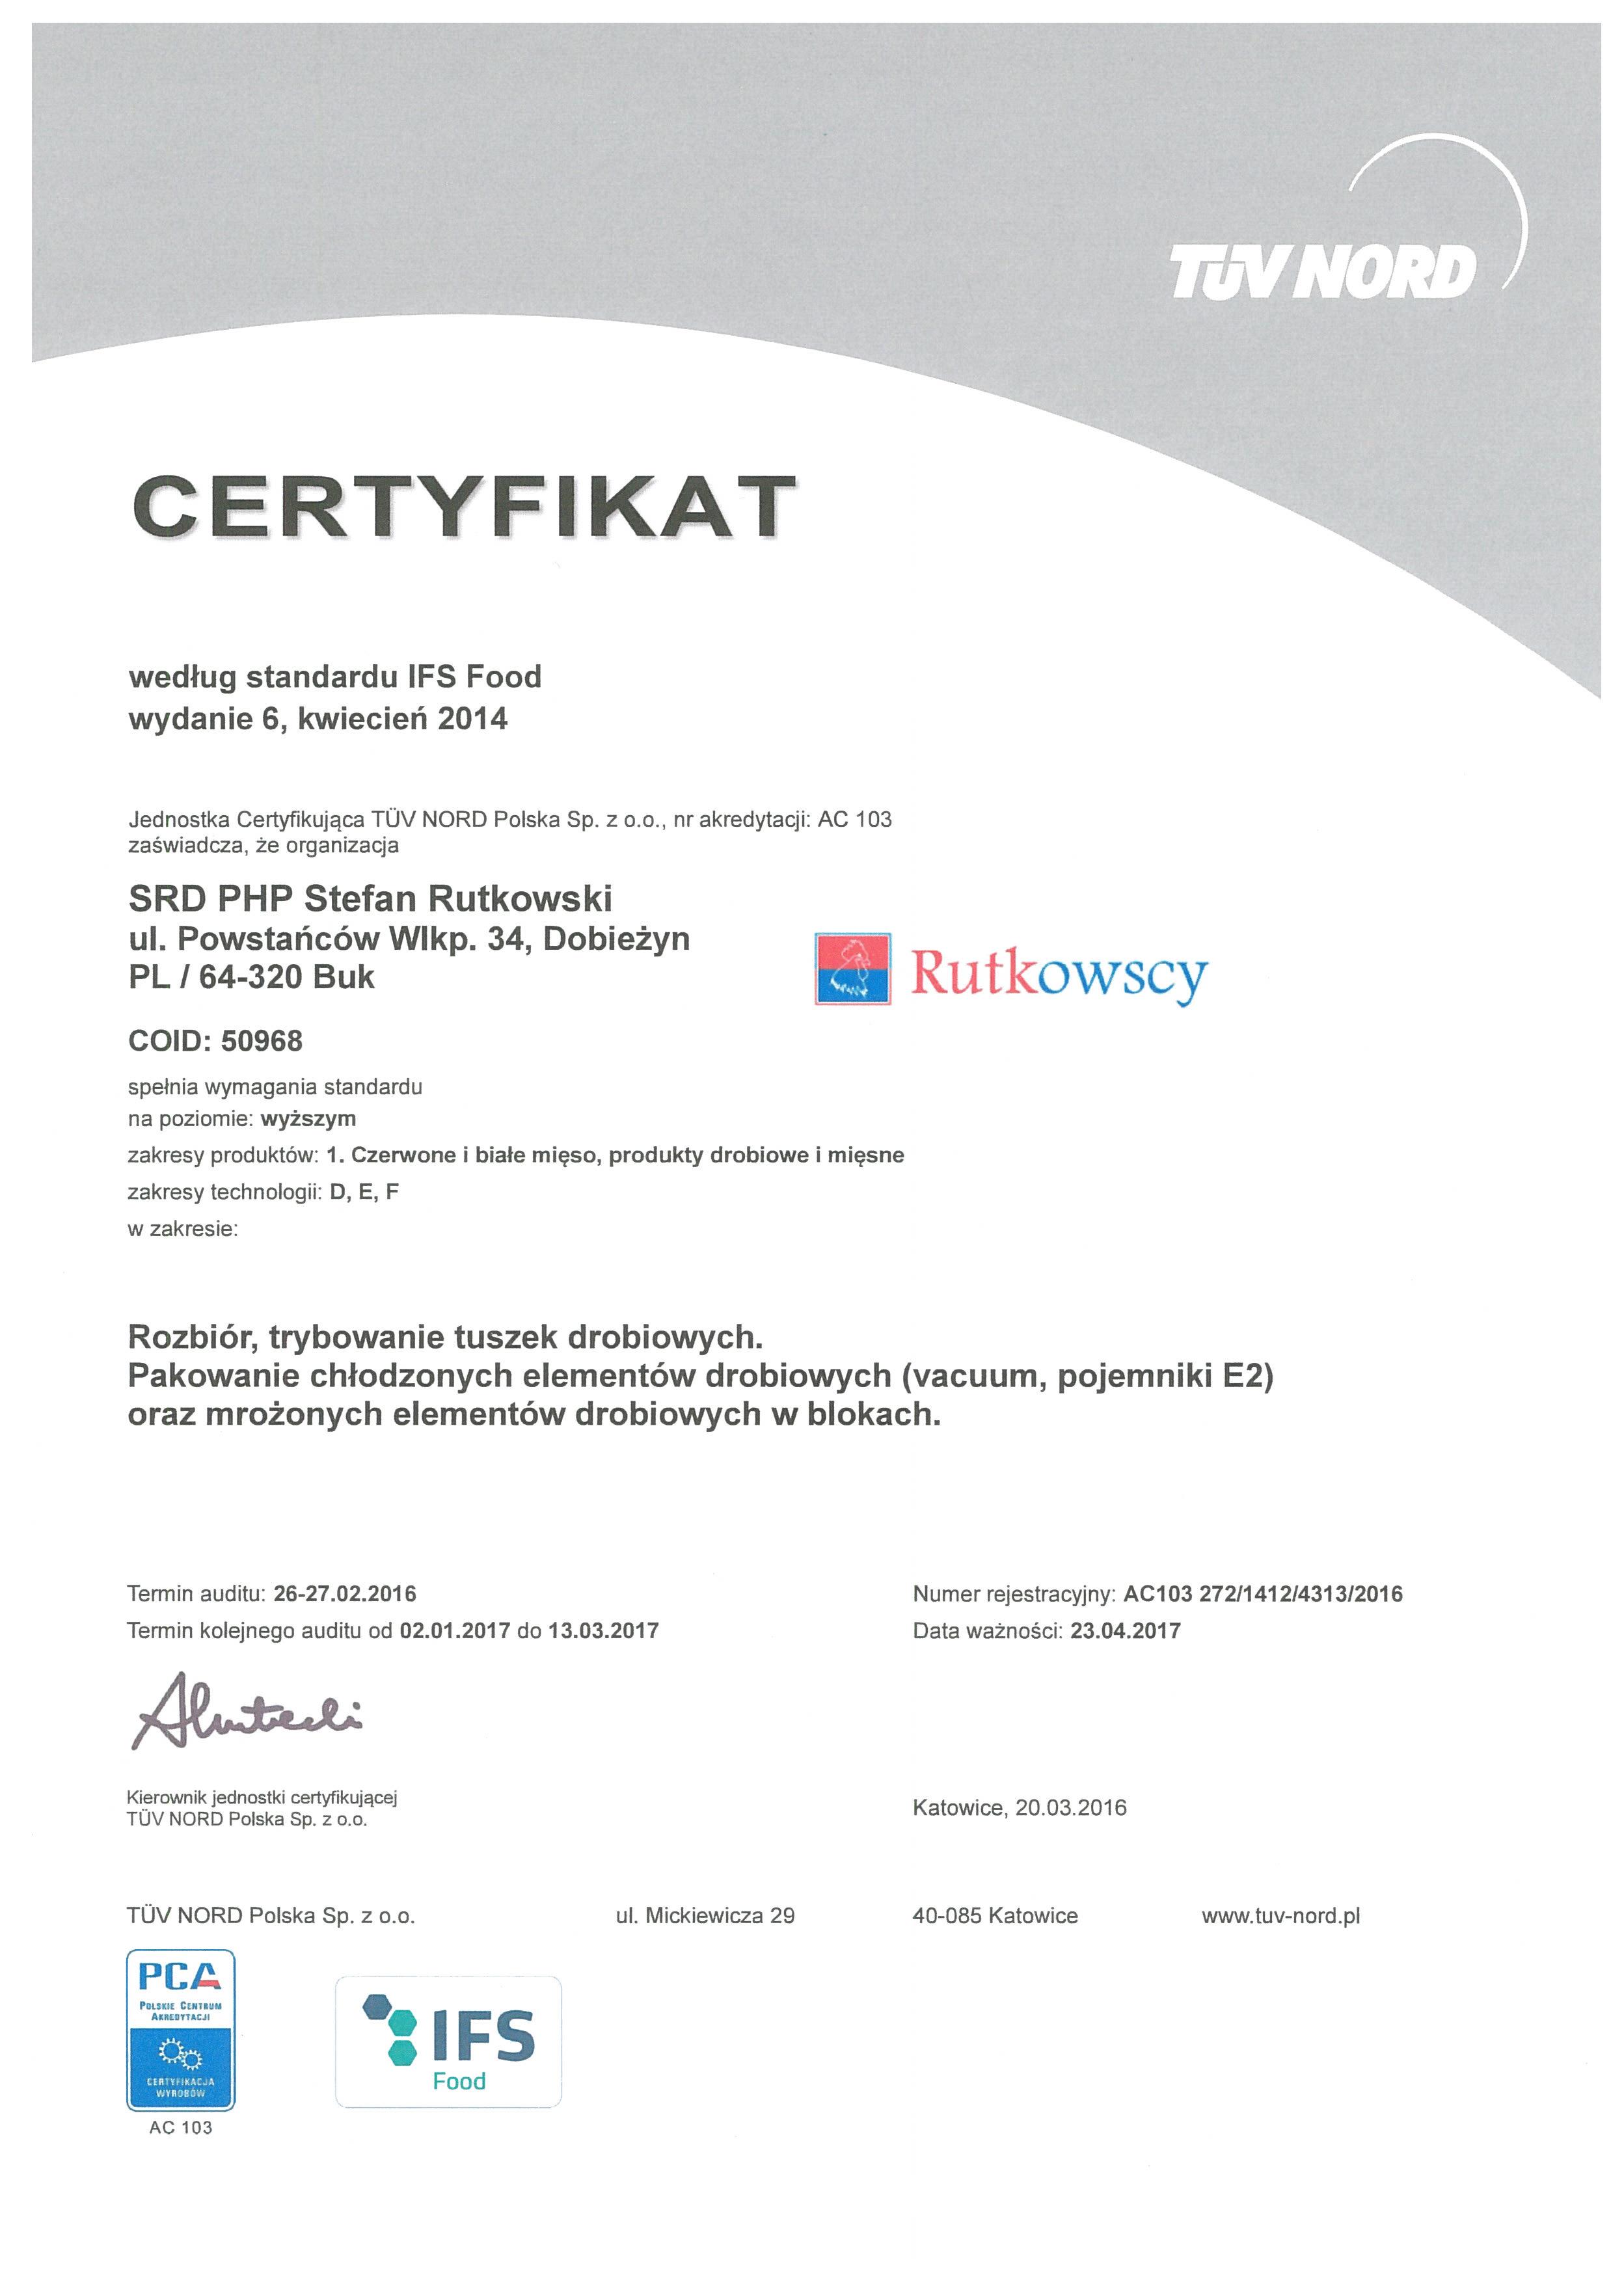 SRD PHP IFS 2016 (1) certyfitat pol